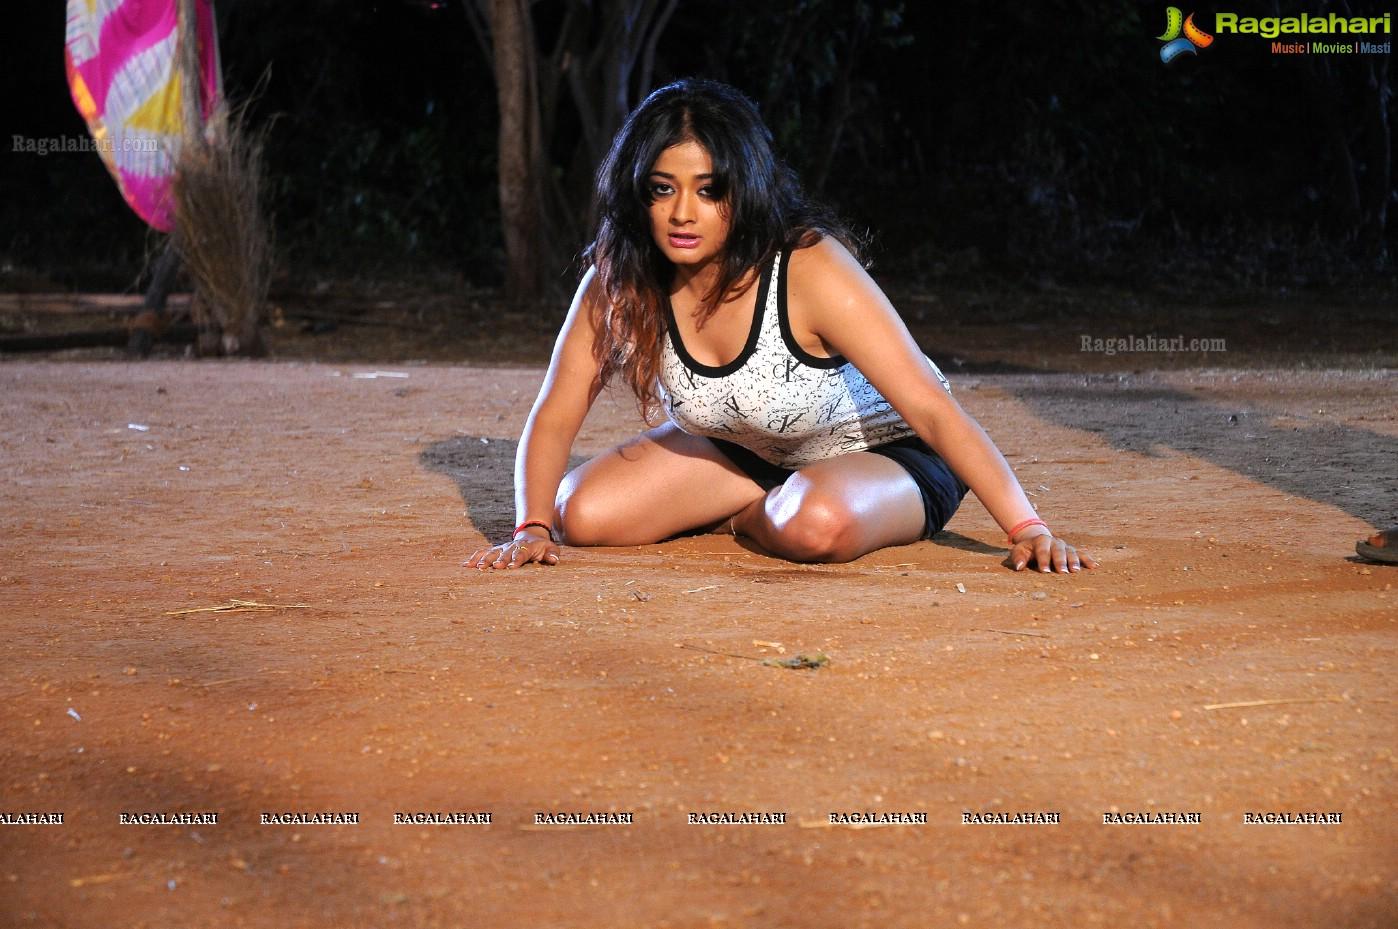 Kiran Rathod (Posters)